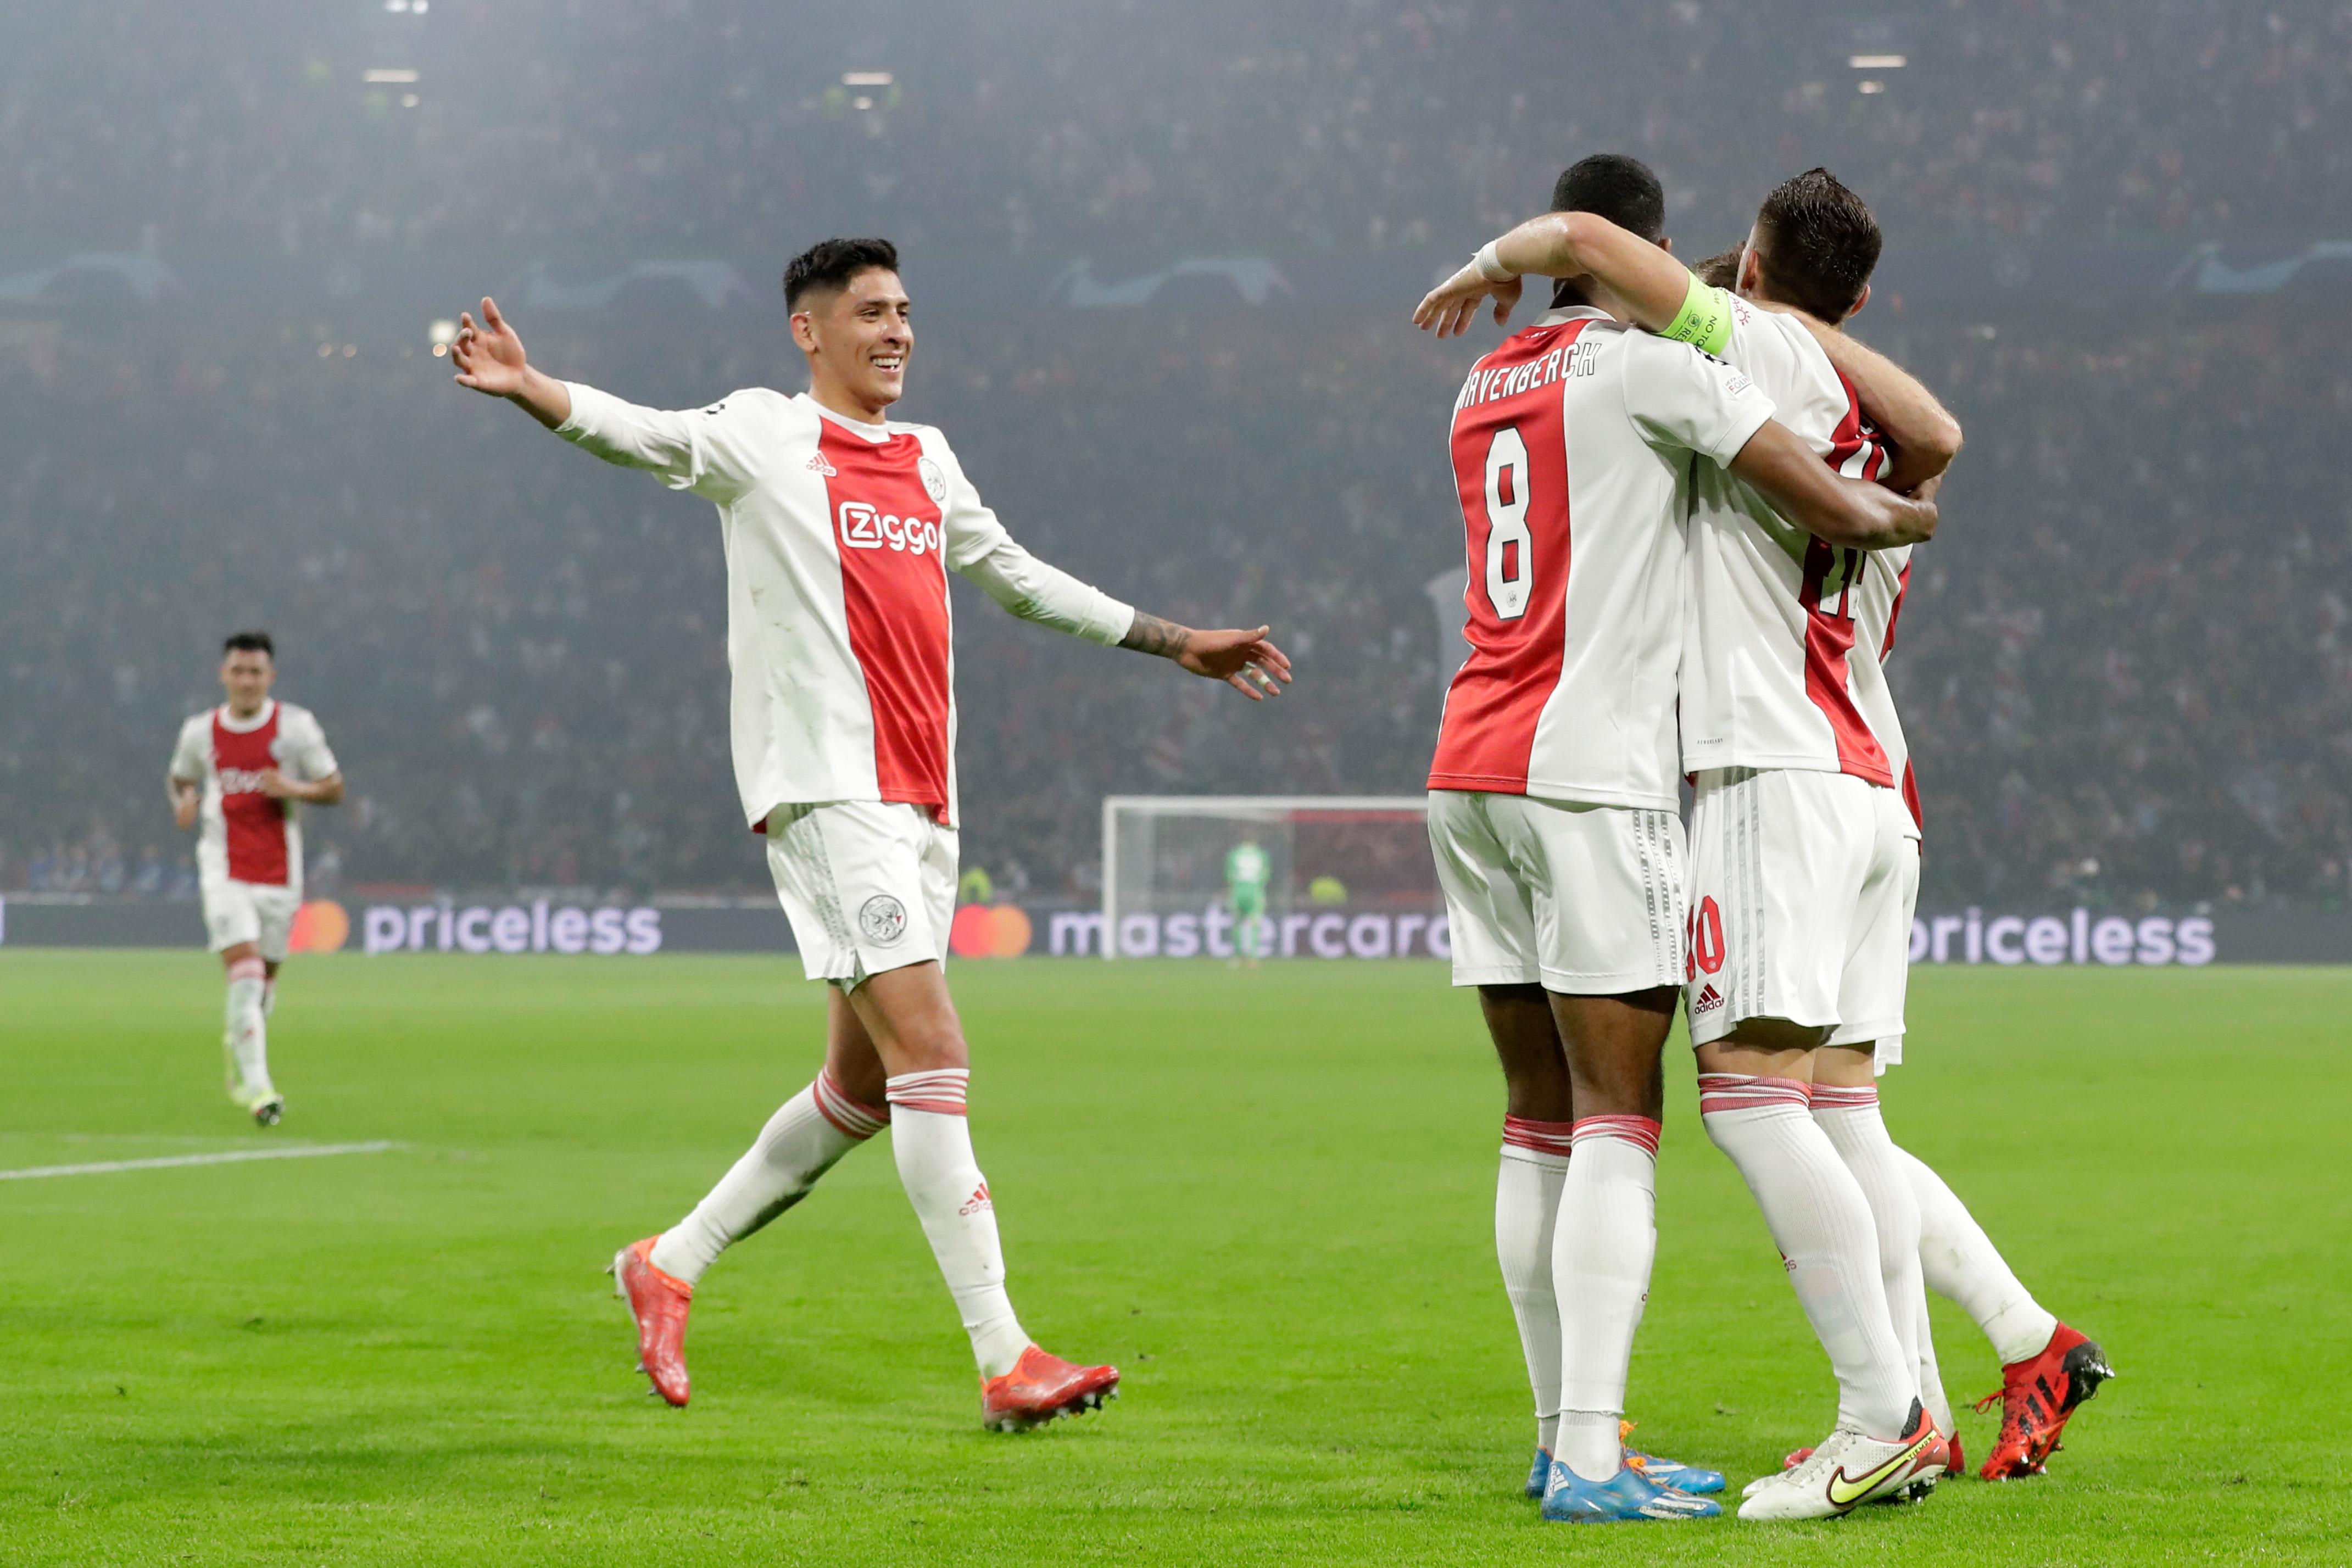 Ajax v Borussia Dortmund - Group C - UEFA Champions League